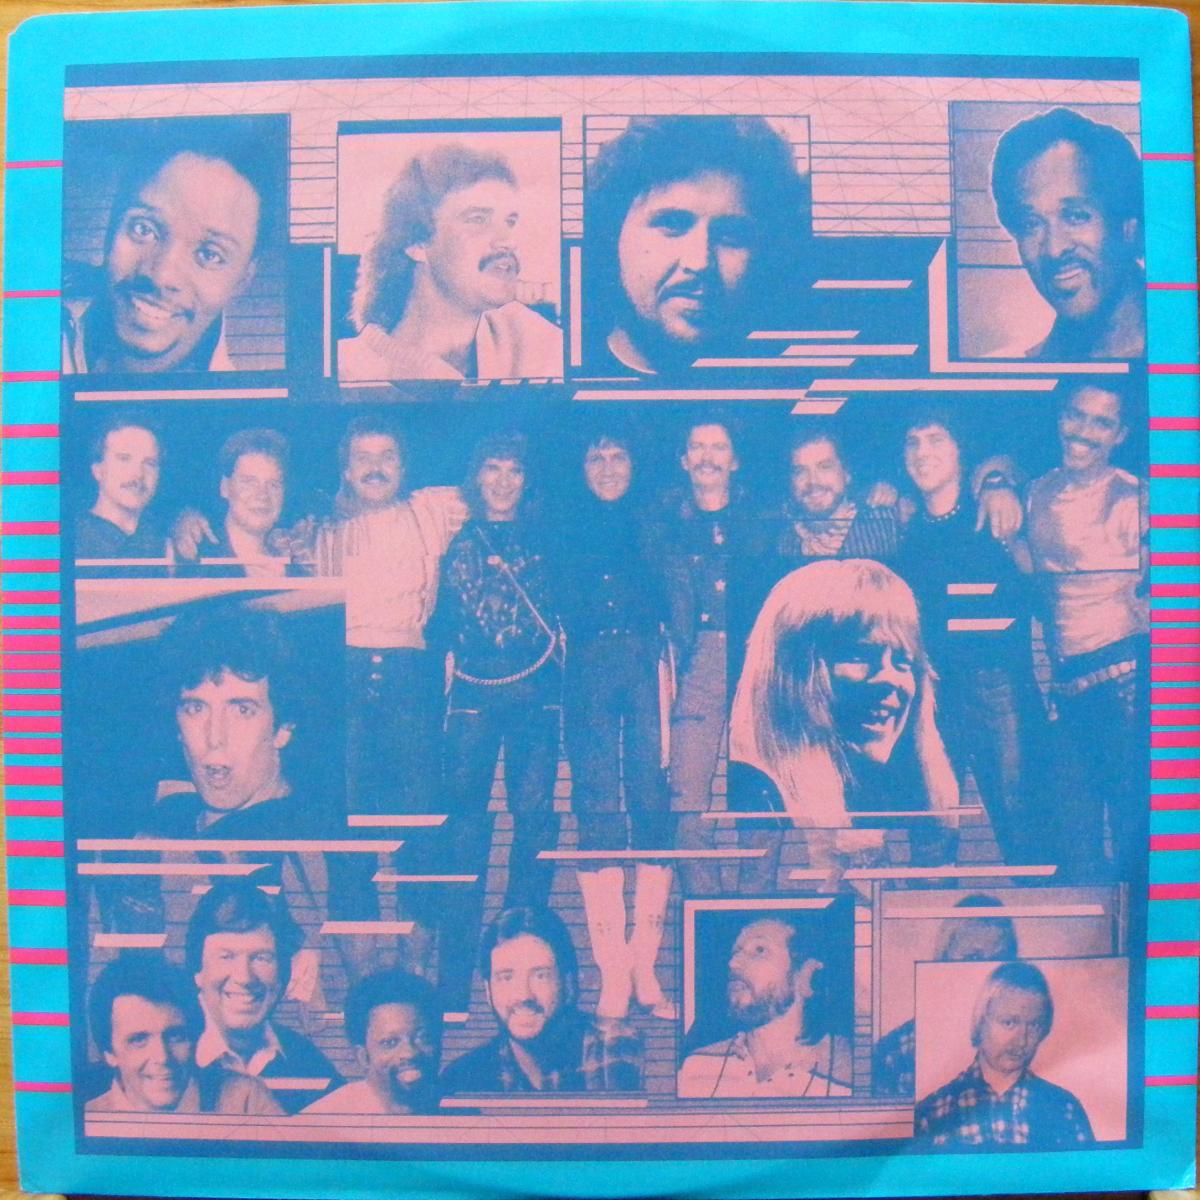 mylon lefevre discography